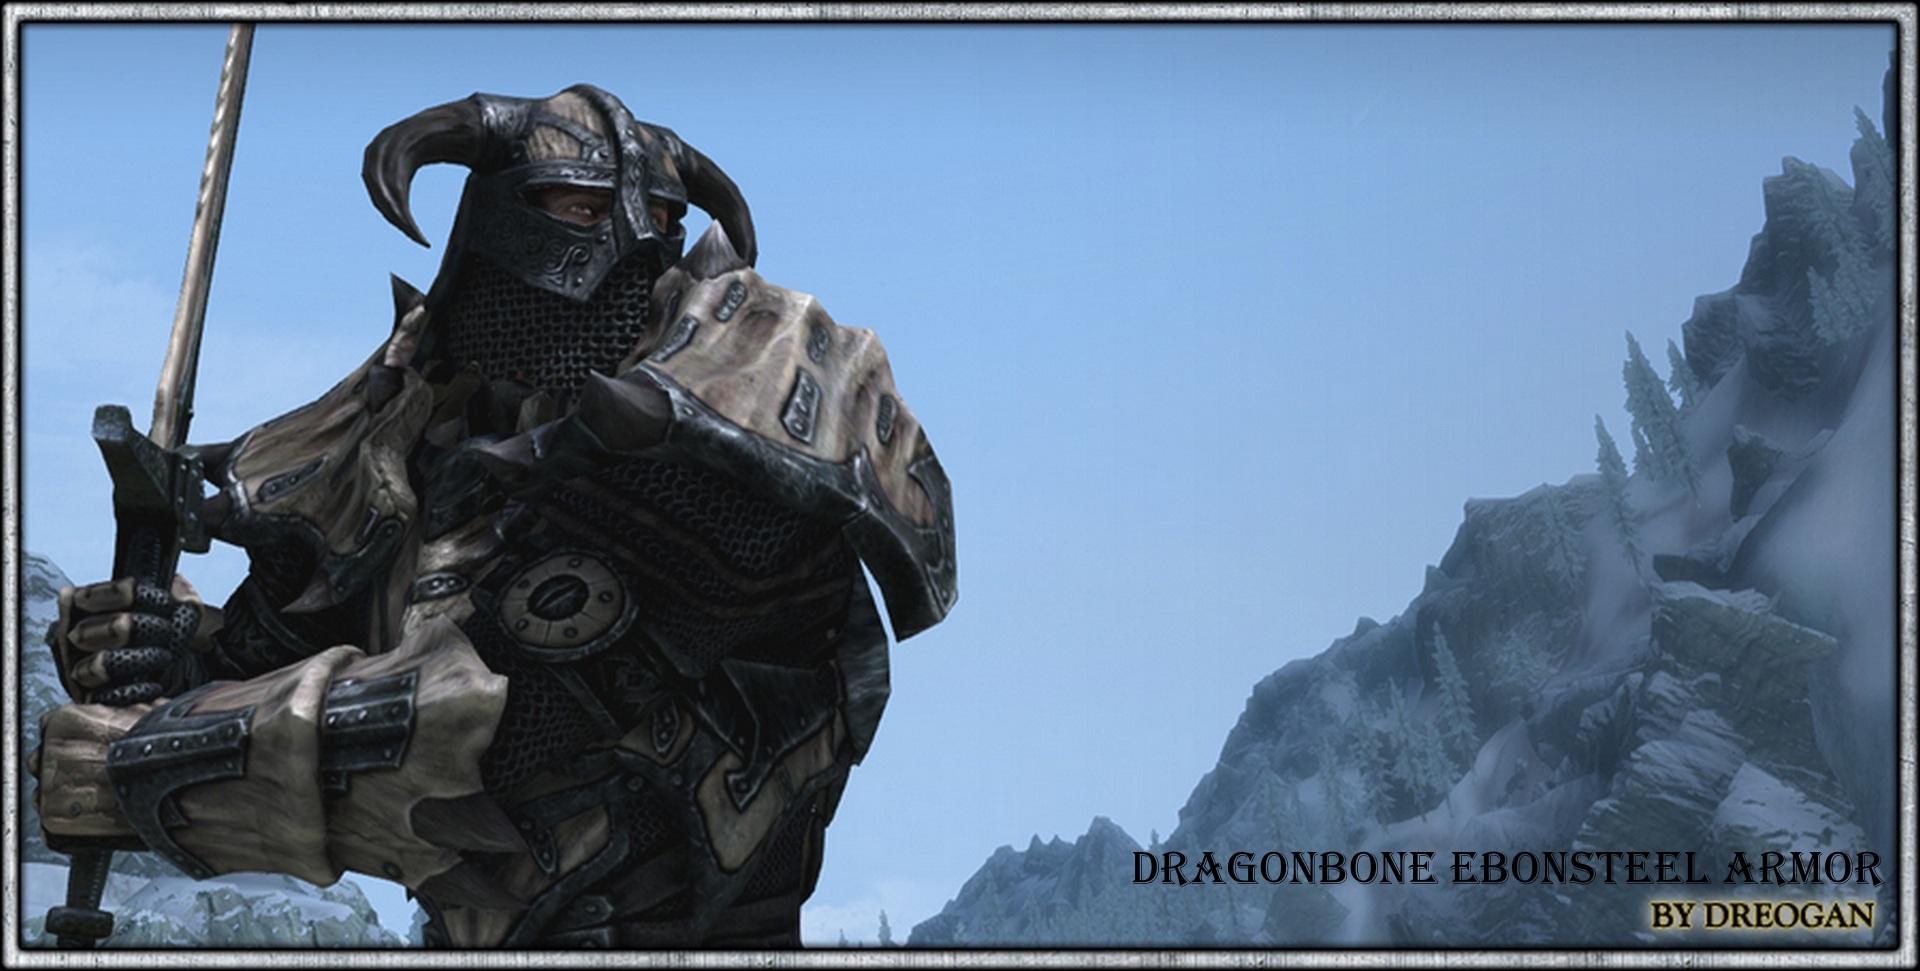 Dragonbone_Ebonsteel_Armor.jpg